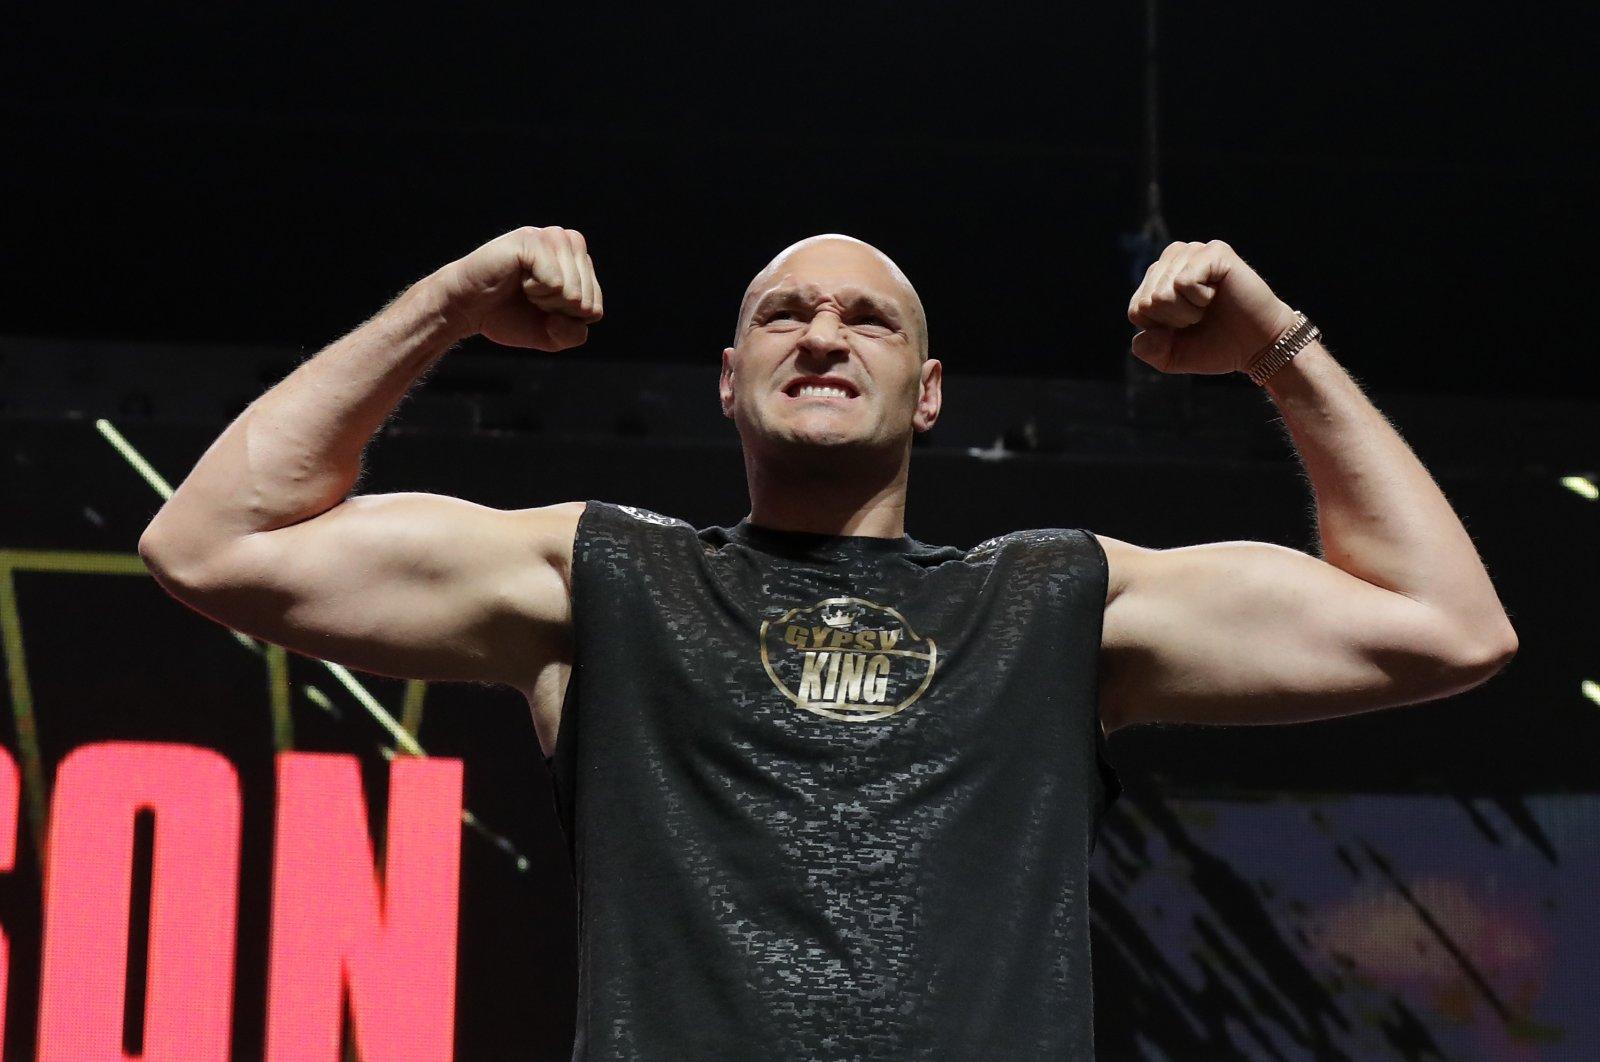 Tyson Fury before a WBC match against Deontay Wilder in Las Vegas, Nevada, U.S., Feb. 21, 2020. (AP Photo)